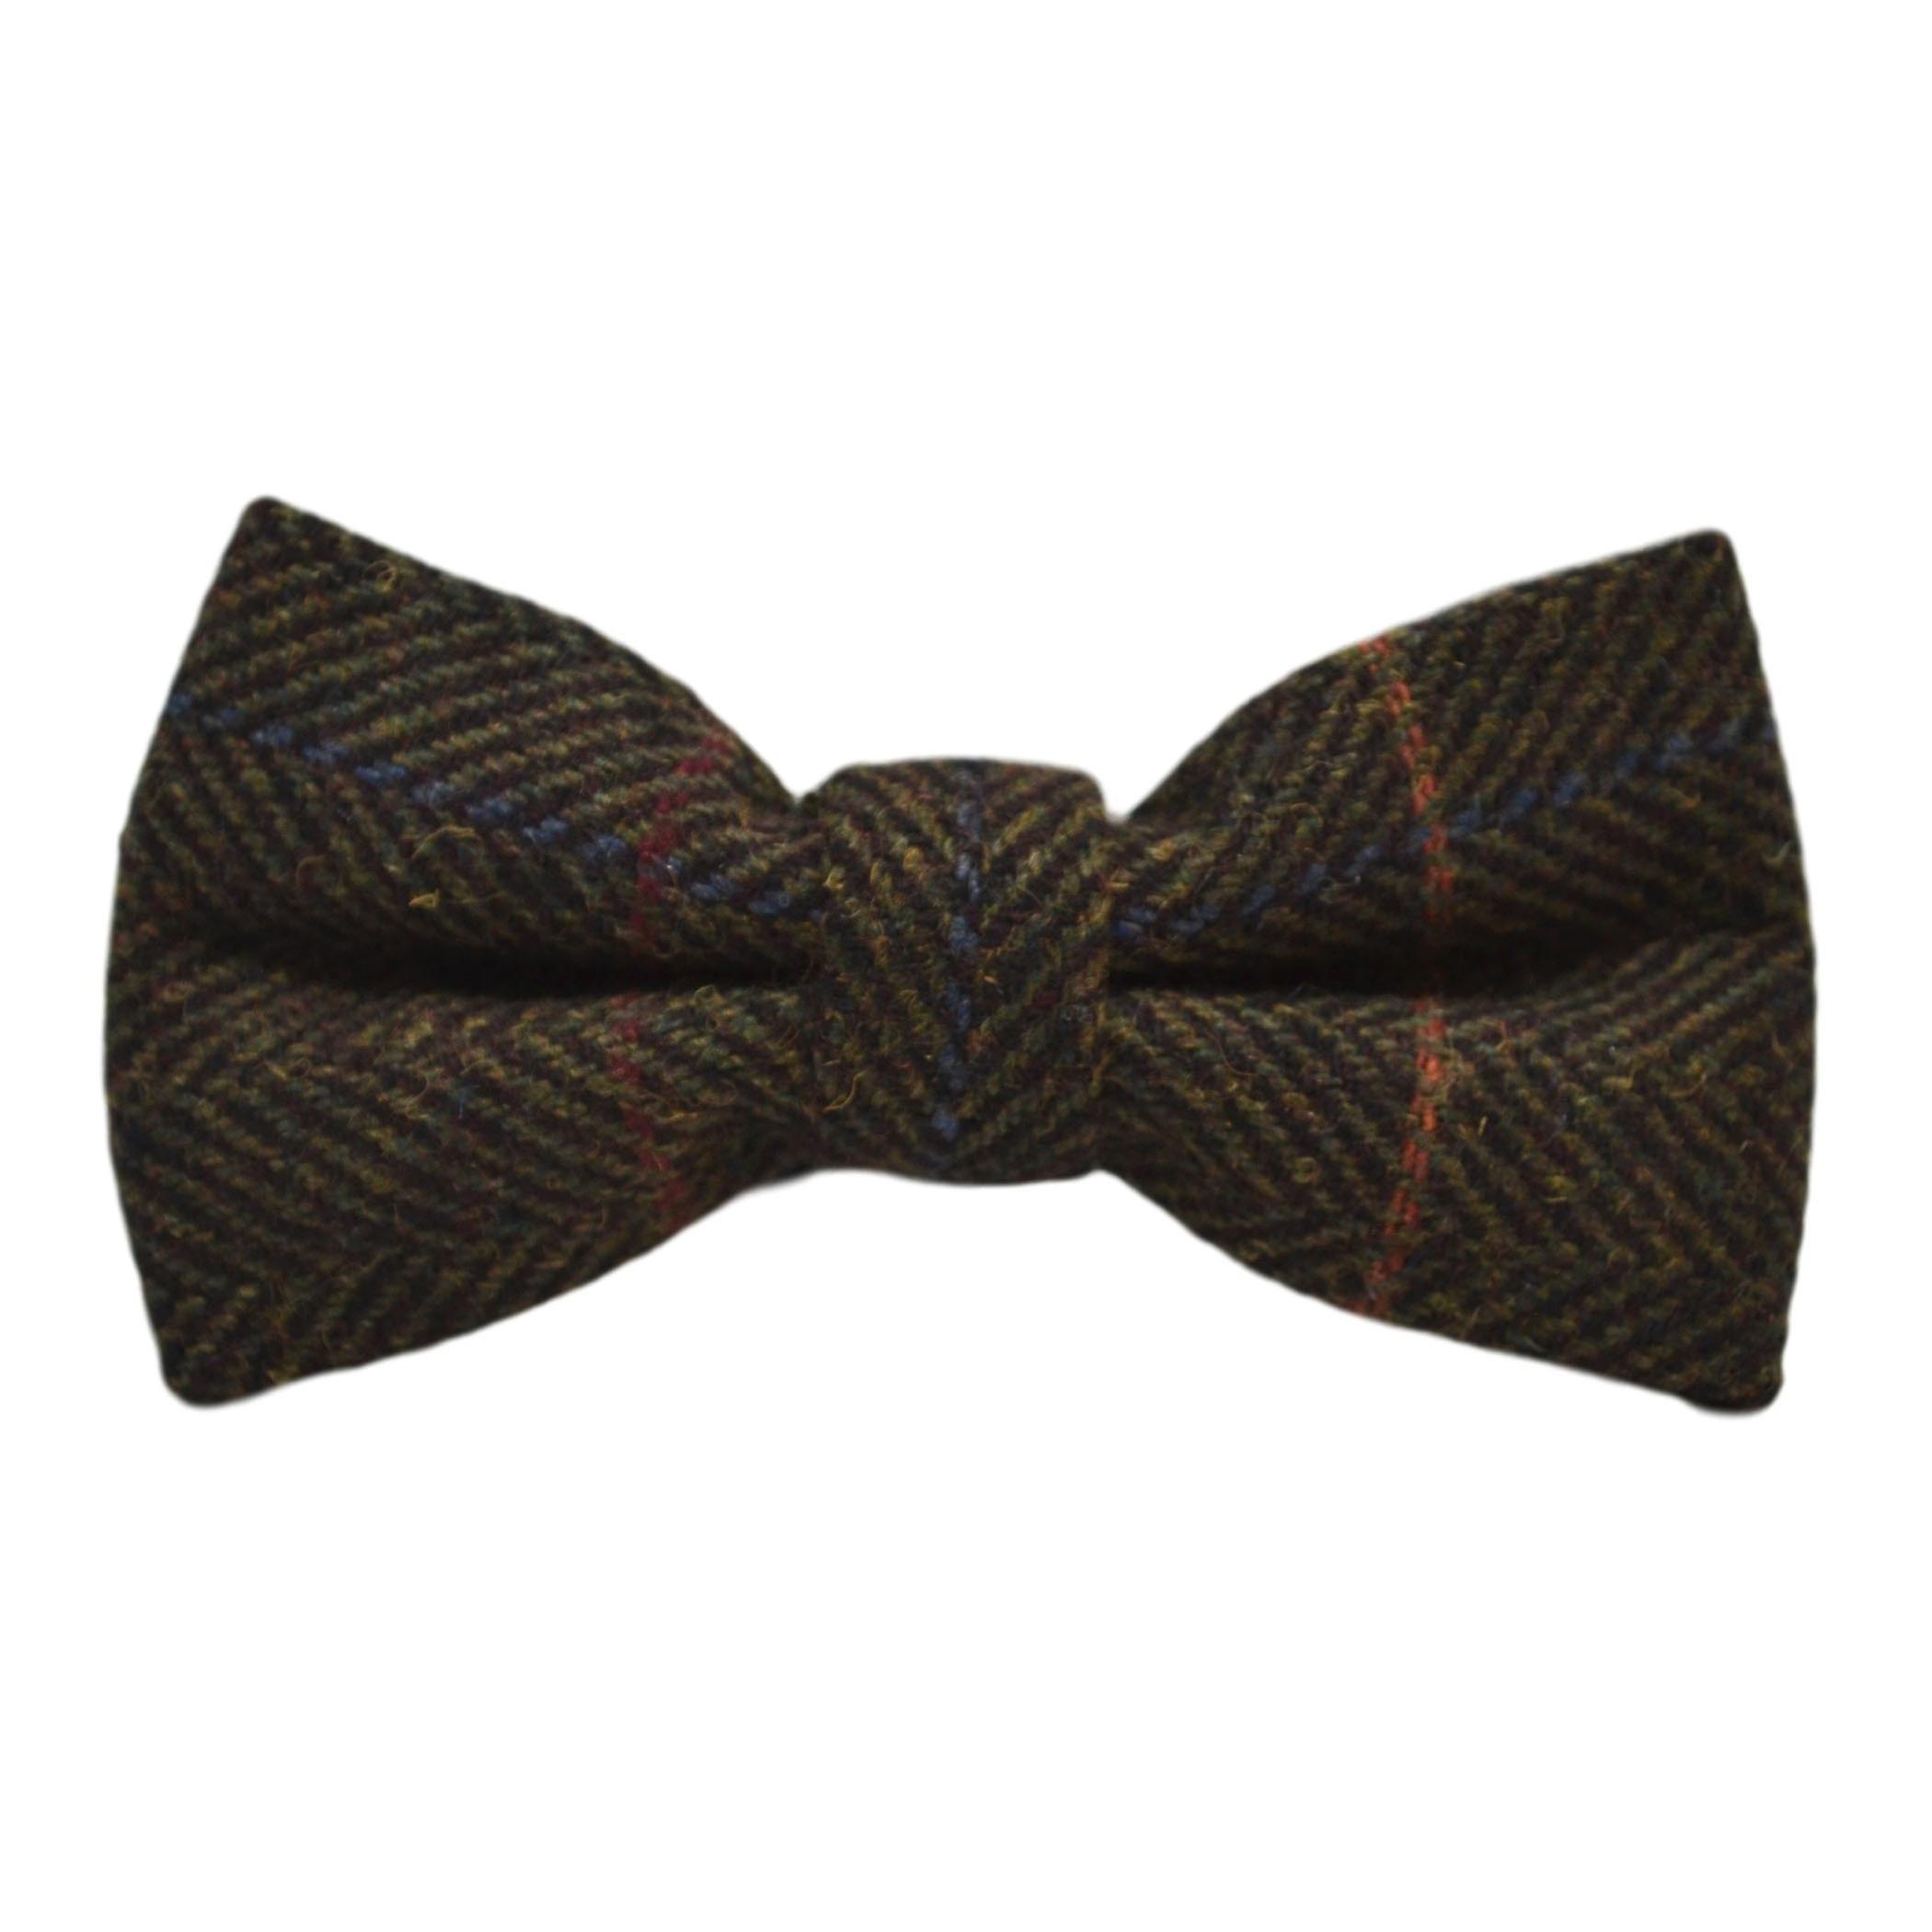 Luxury Dark Olive Green Herringbone Check Bow Tie & Pocket Square Set, Tweed